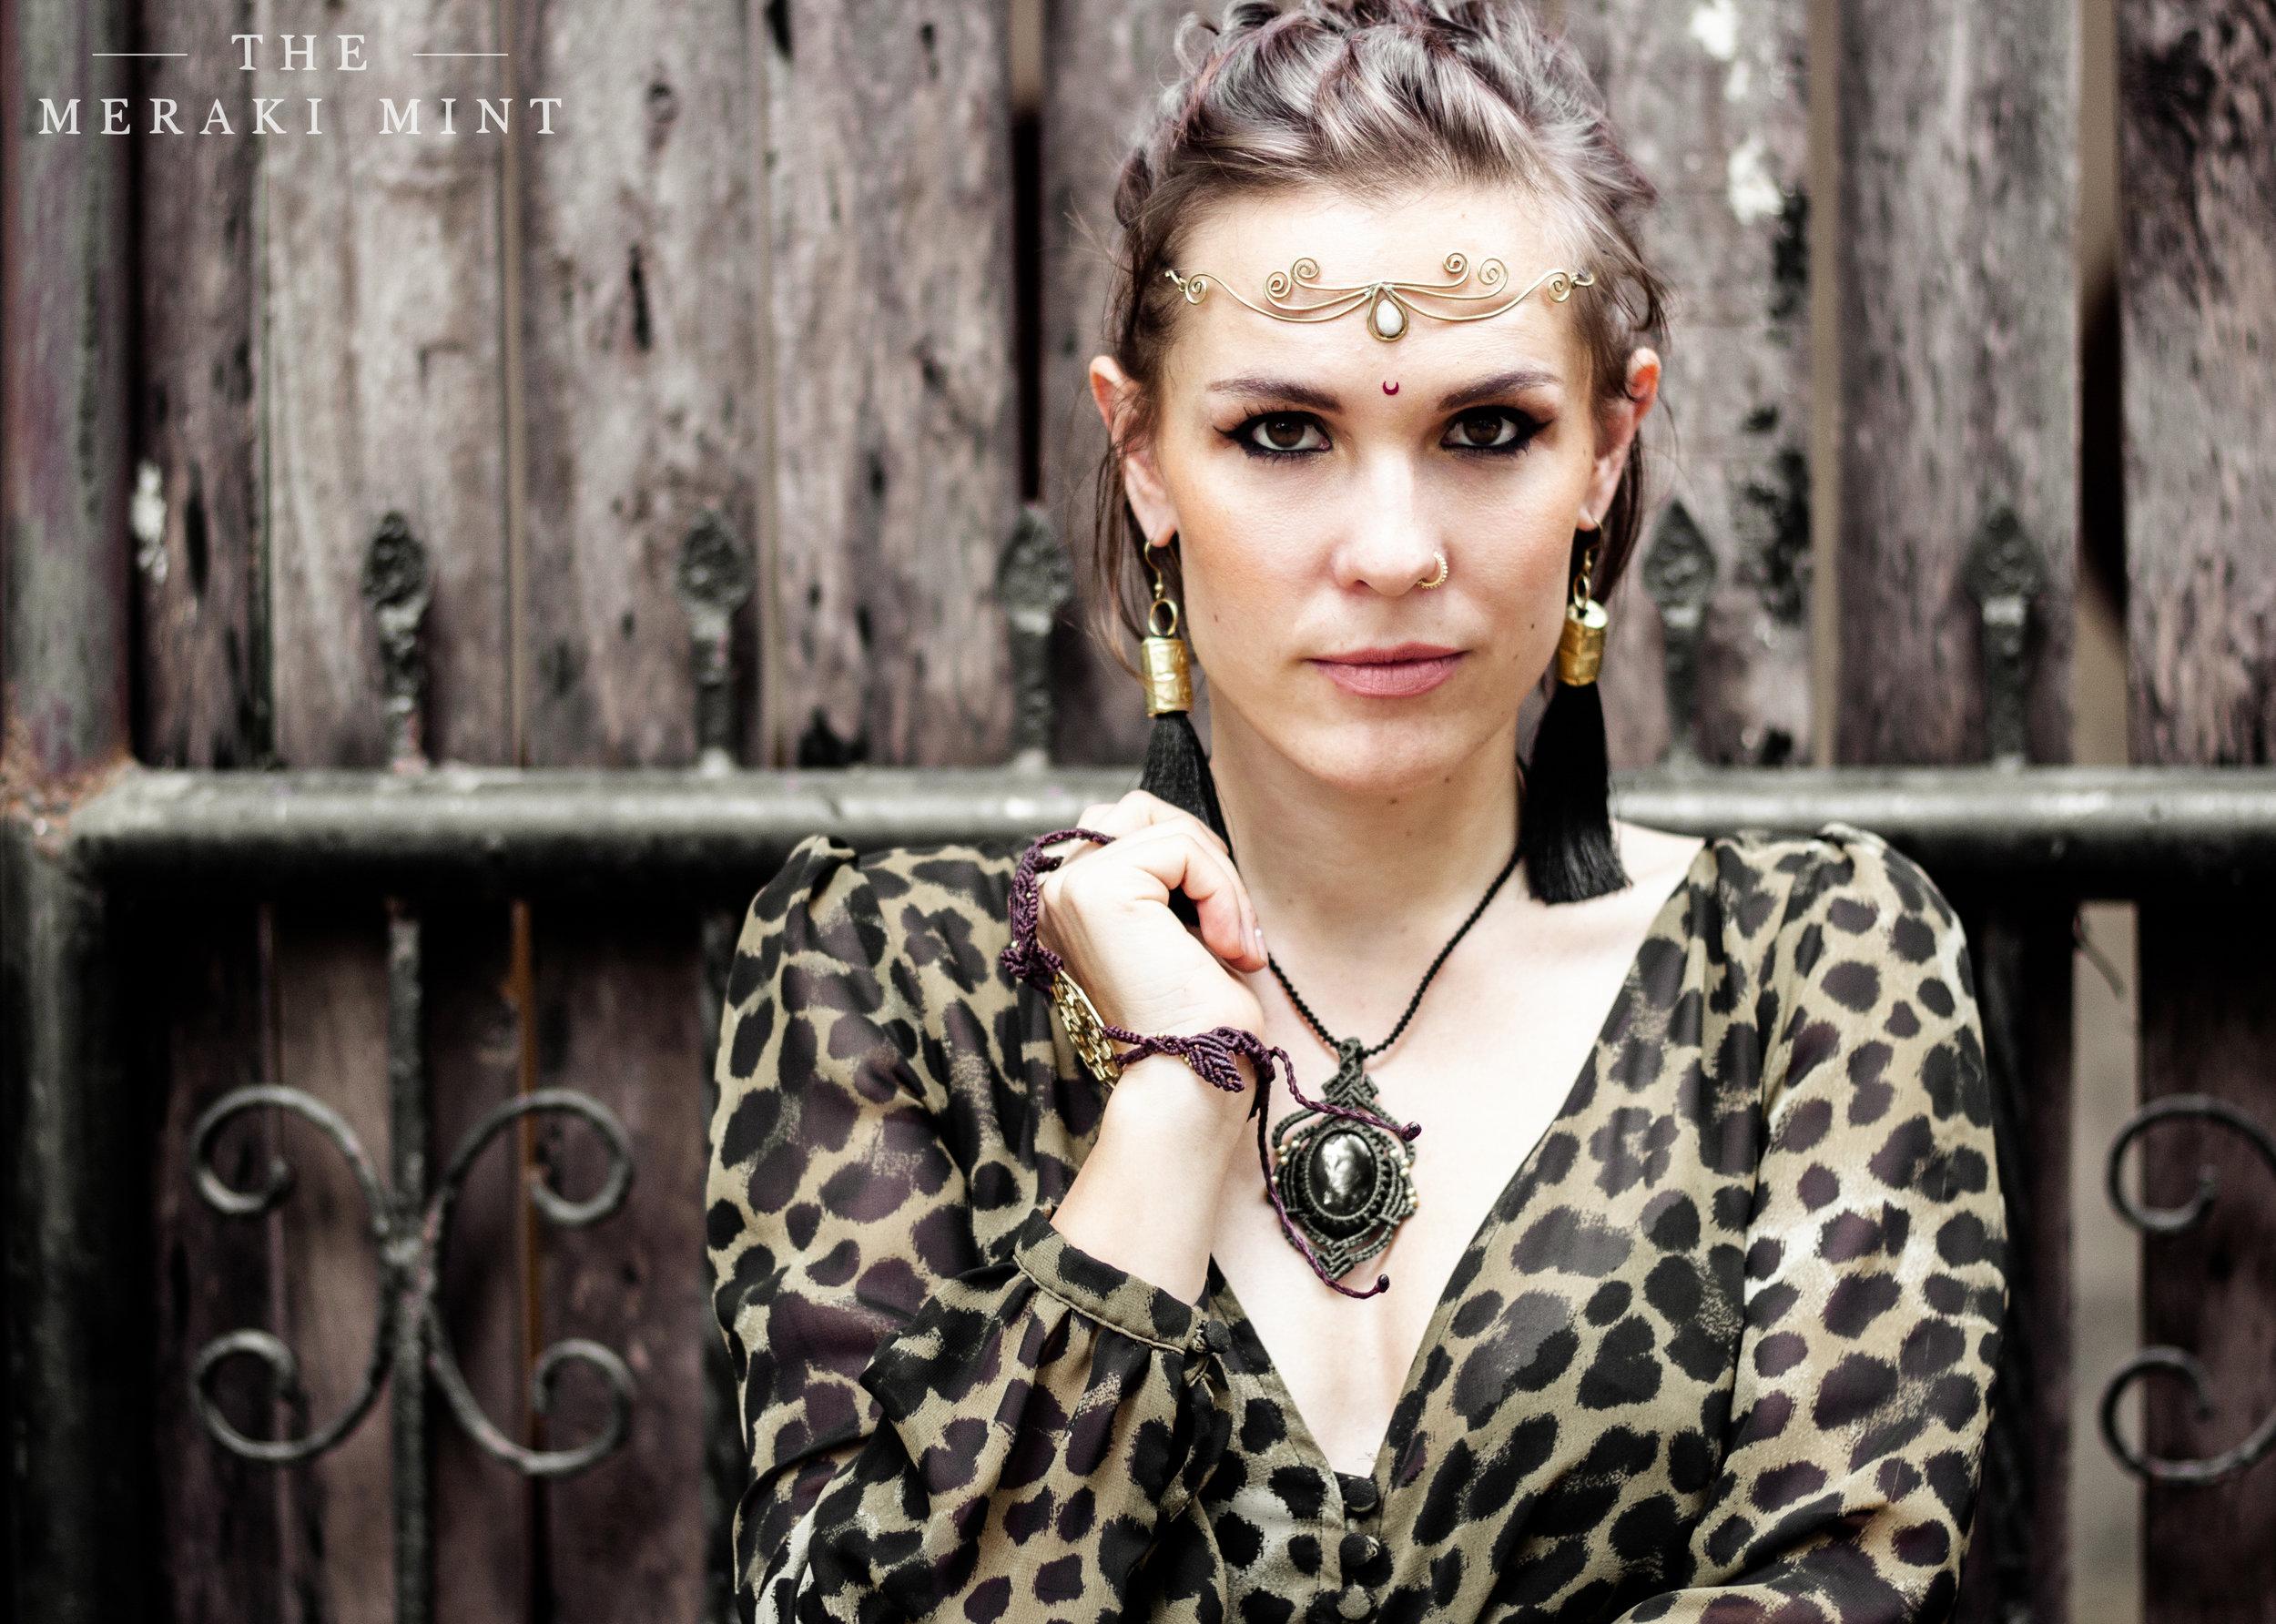 The-Meraki-Mint-Main-Page-Woman-Macrame-Jewelry-Fence.jpg